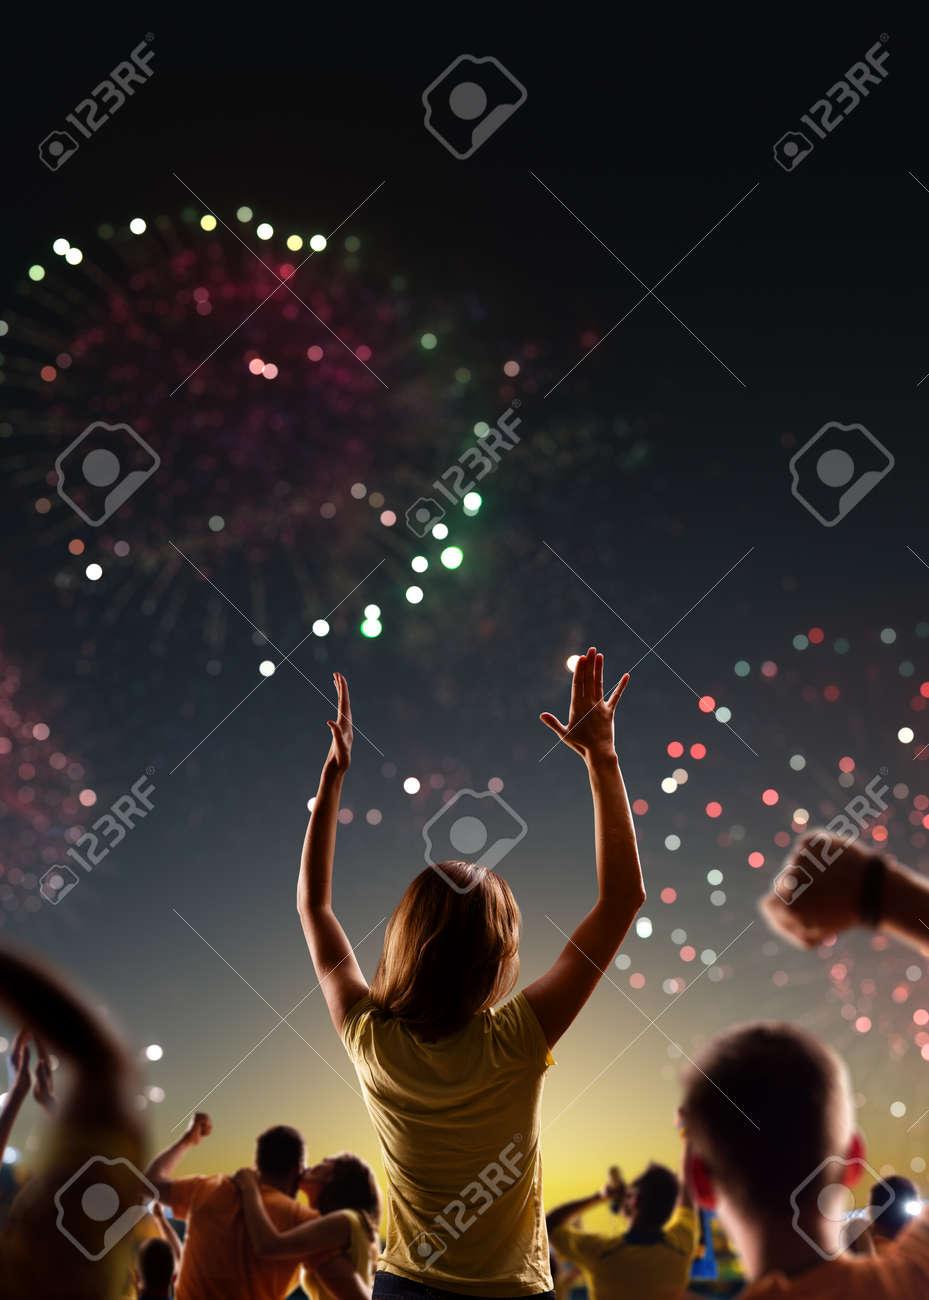 Fans celebrate in Stadium Arena night fireworks - 157291882